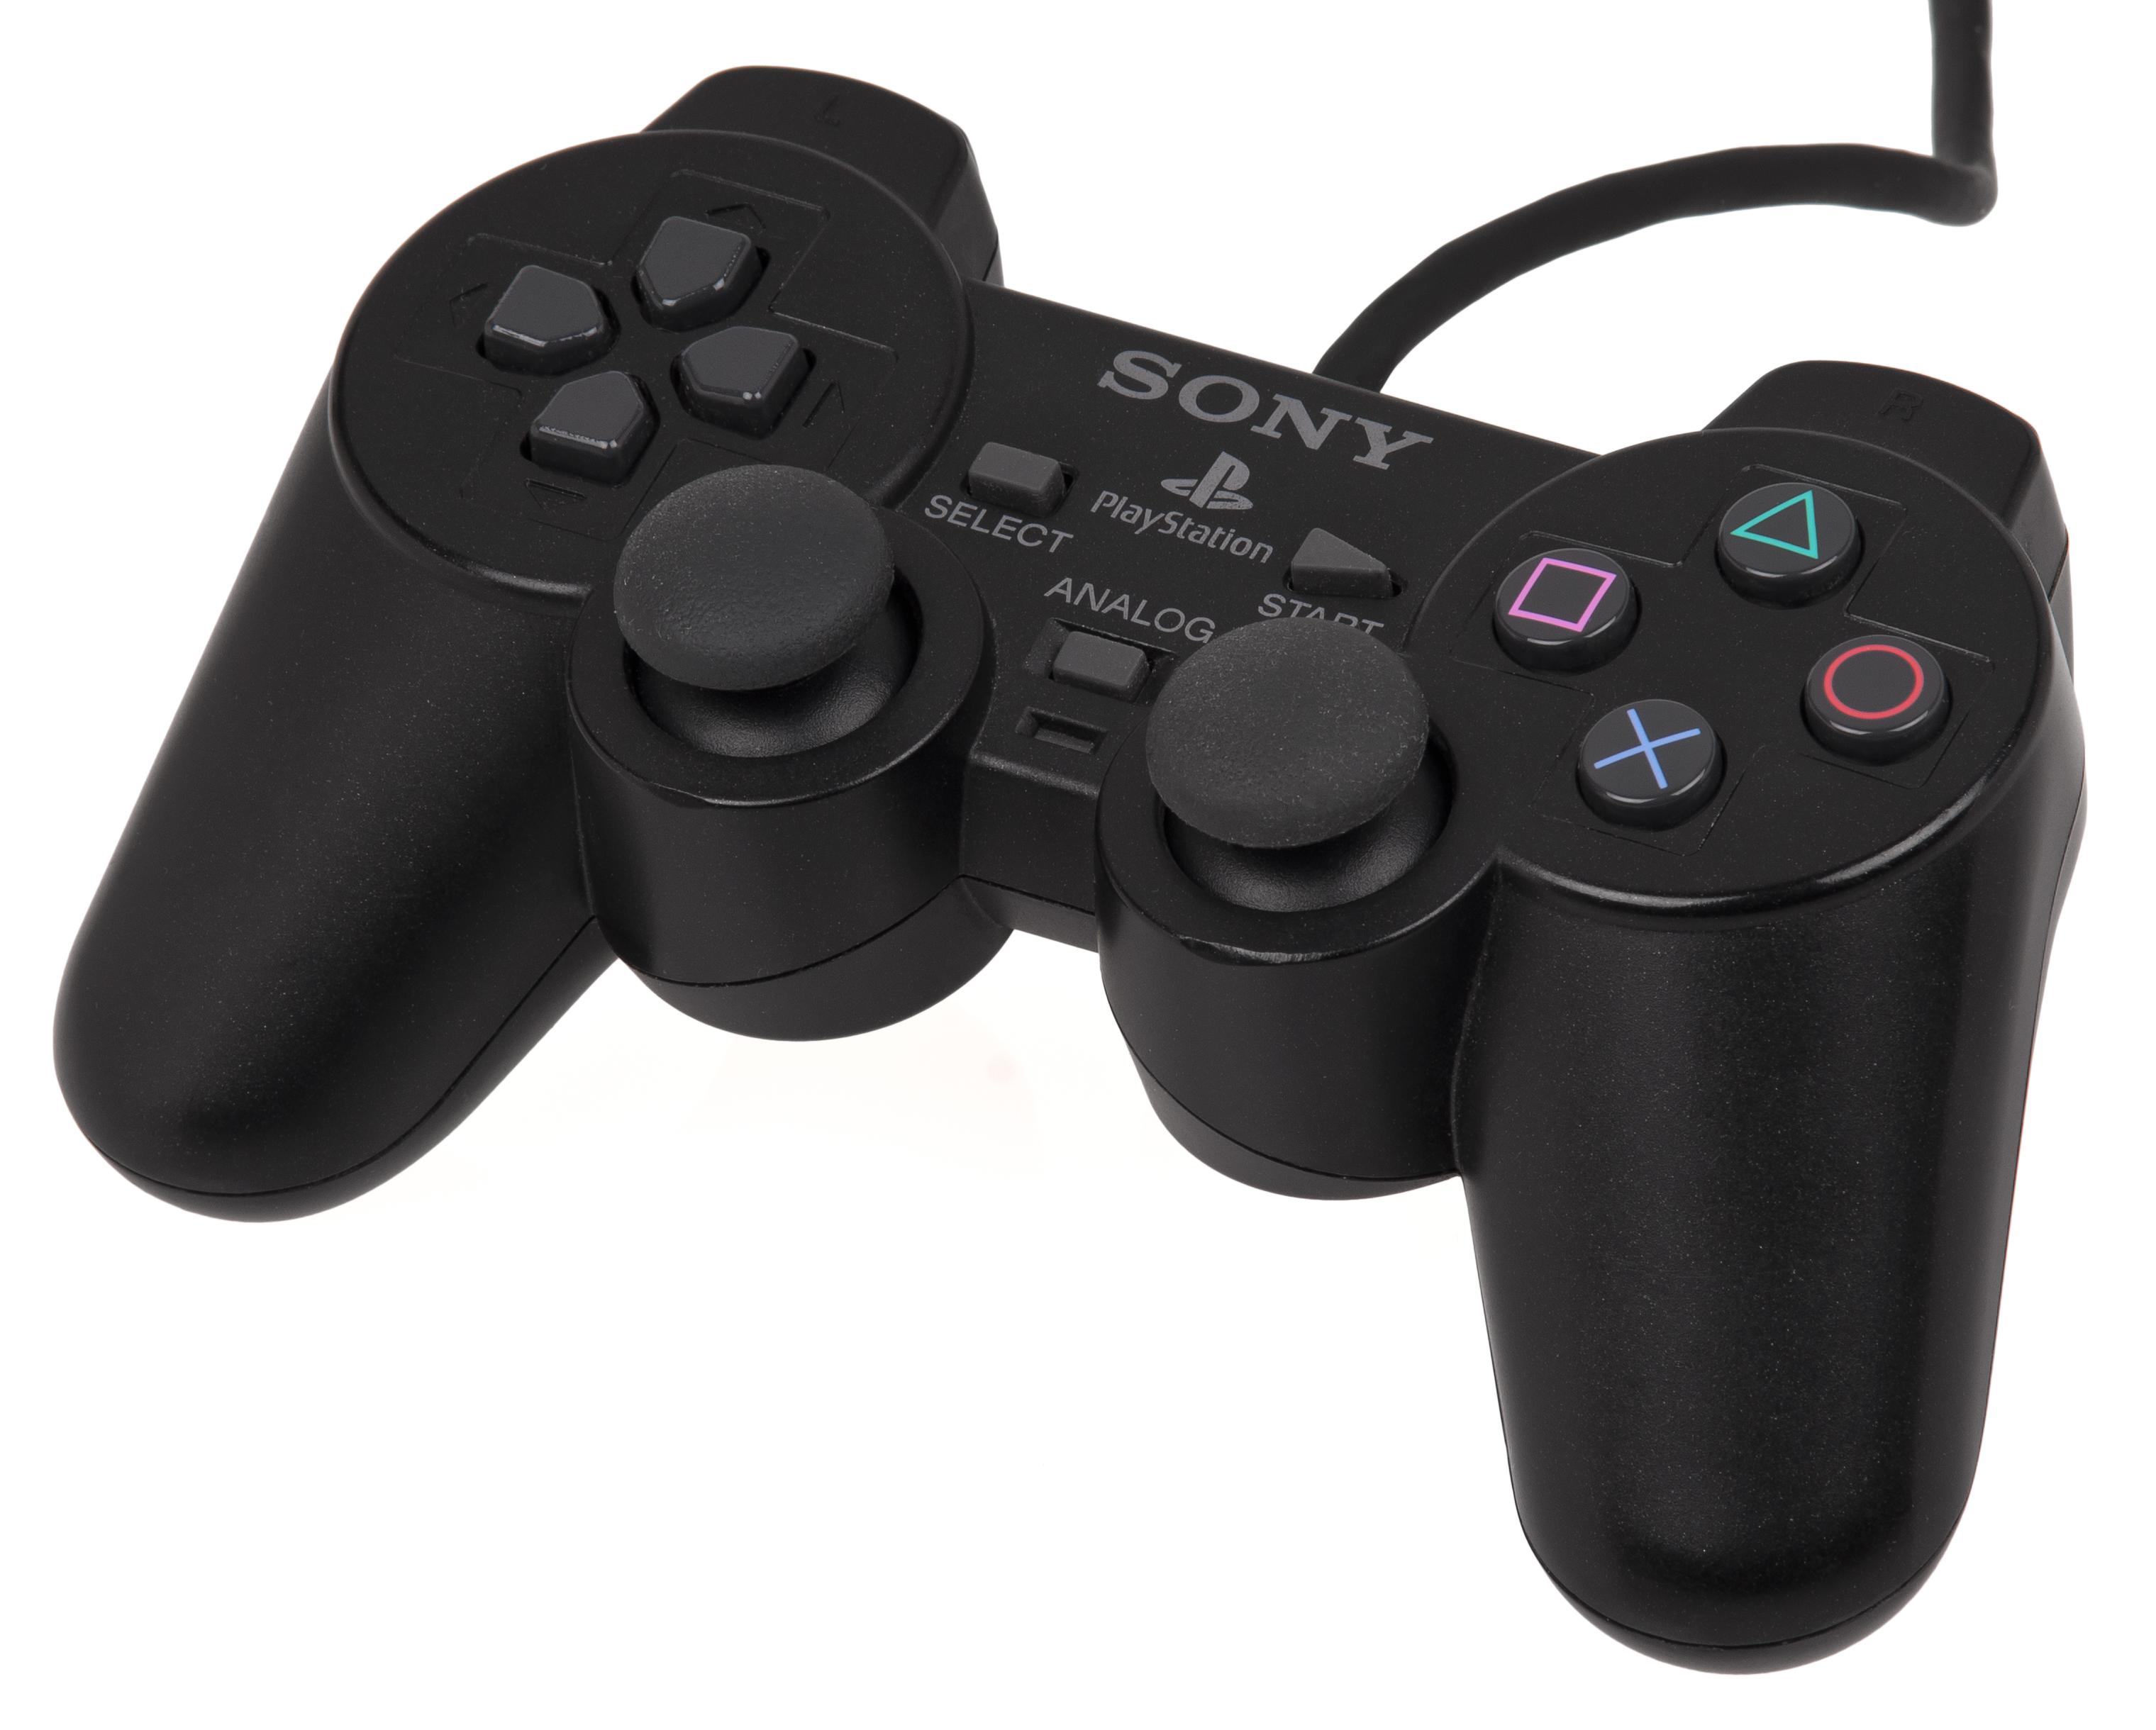 DualShock 2 Controller